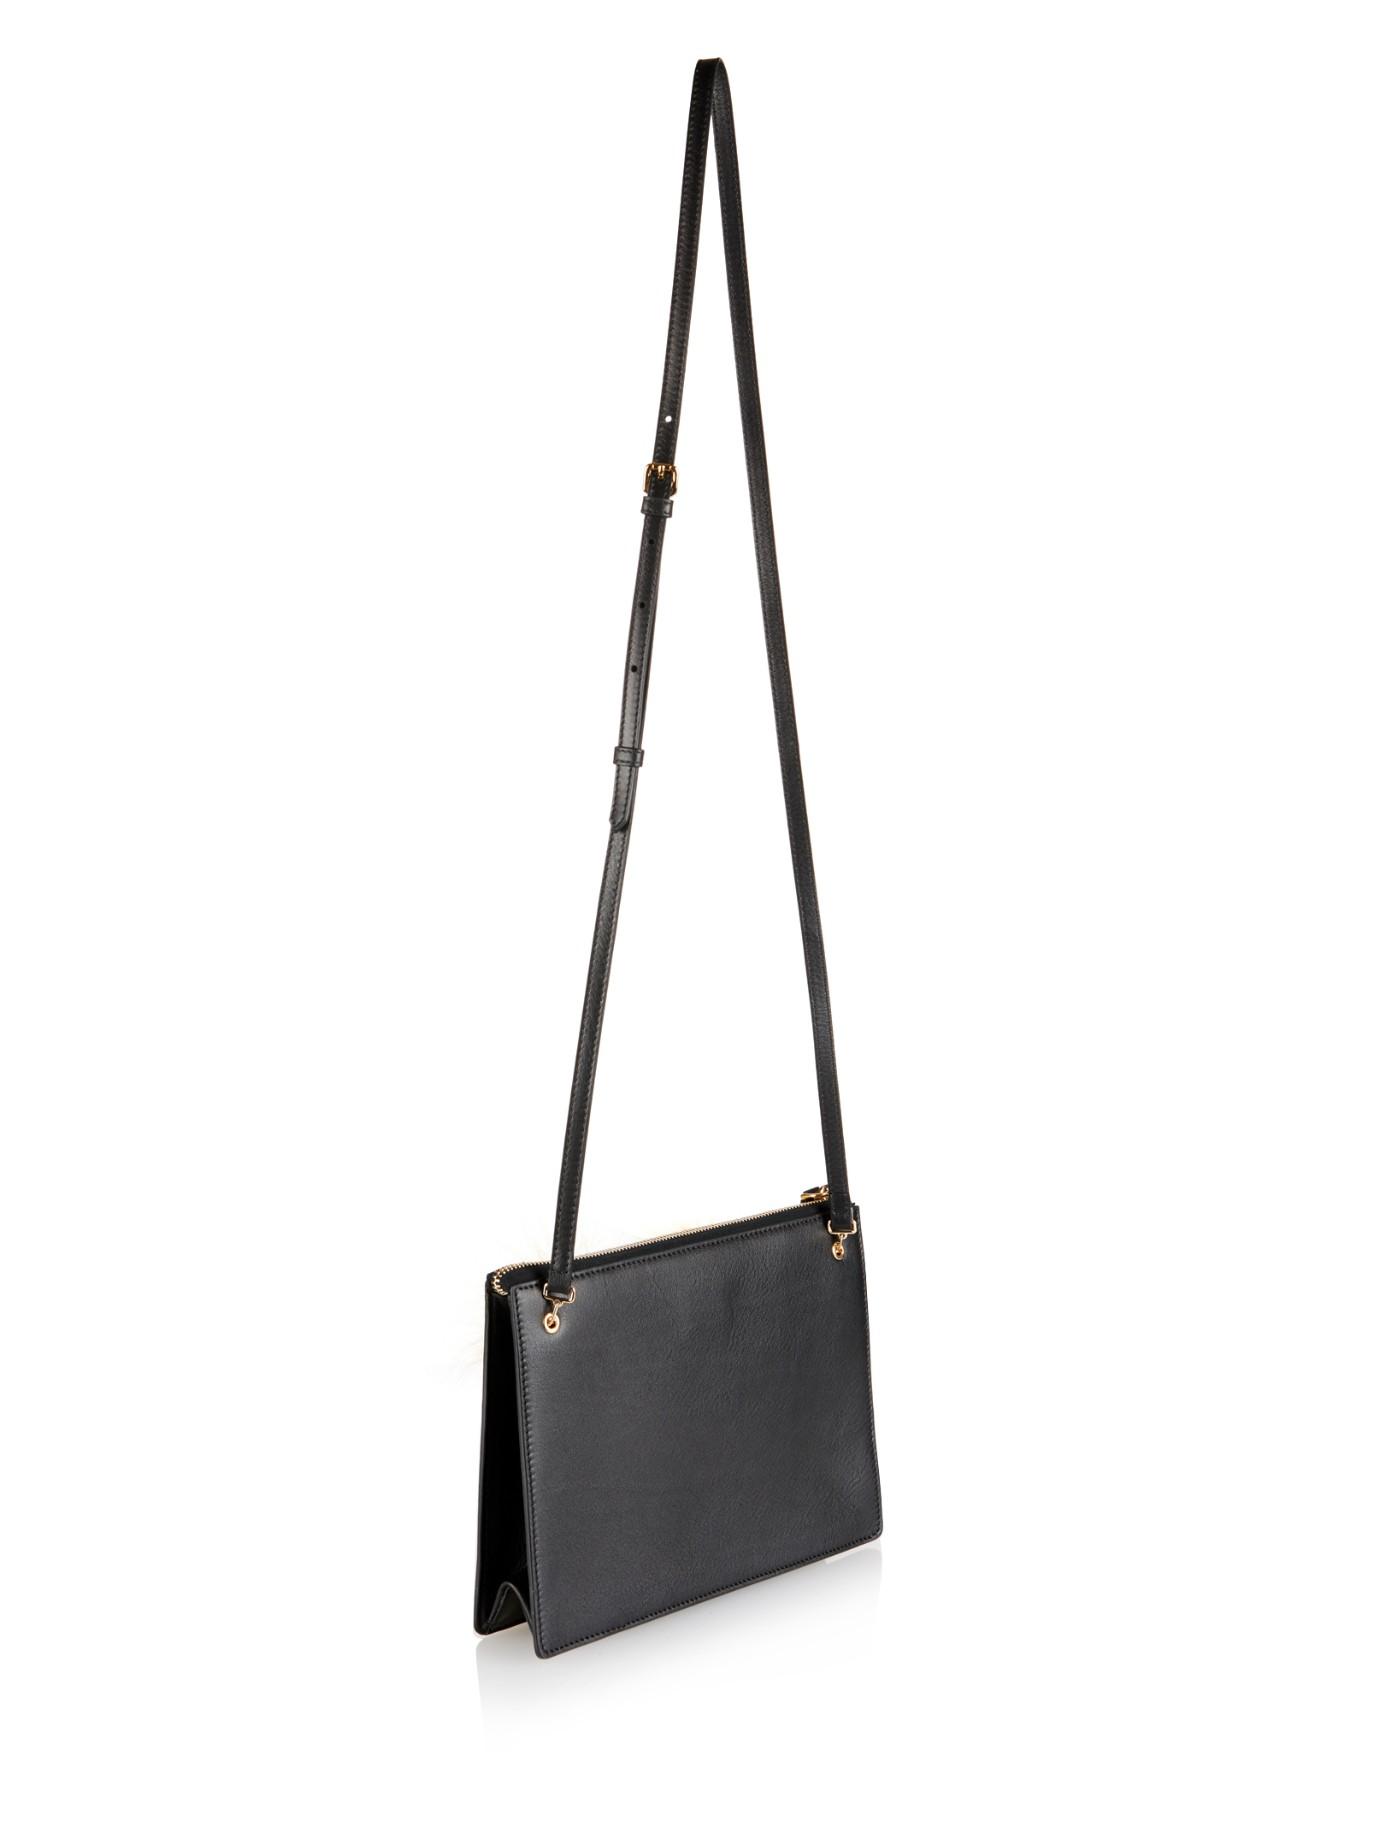 c6370558b3 Gallery. Previously sold at  MATCHESFASHION.COM · Women s Fendi 2jours  Women s Fendi Bag Bugs ...